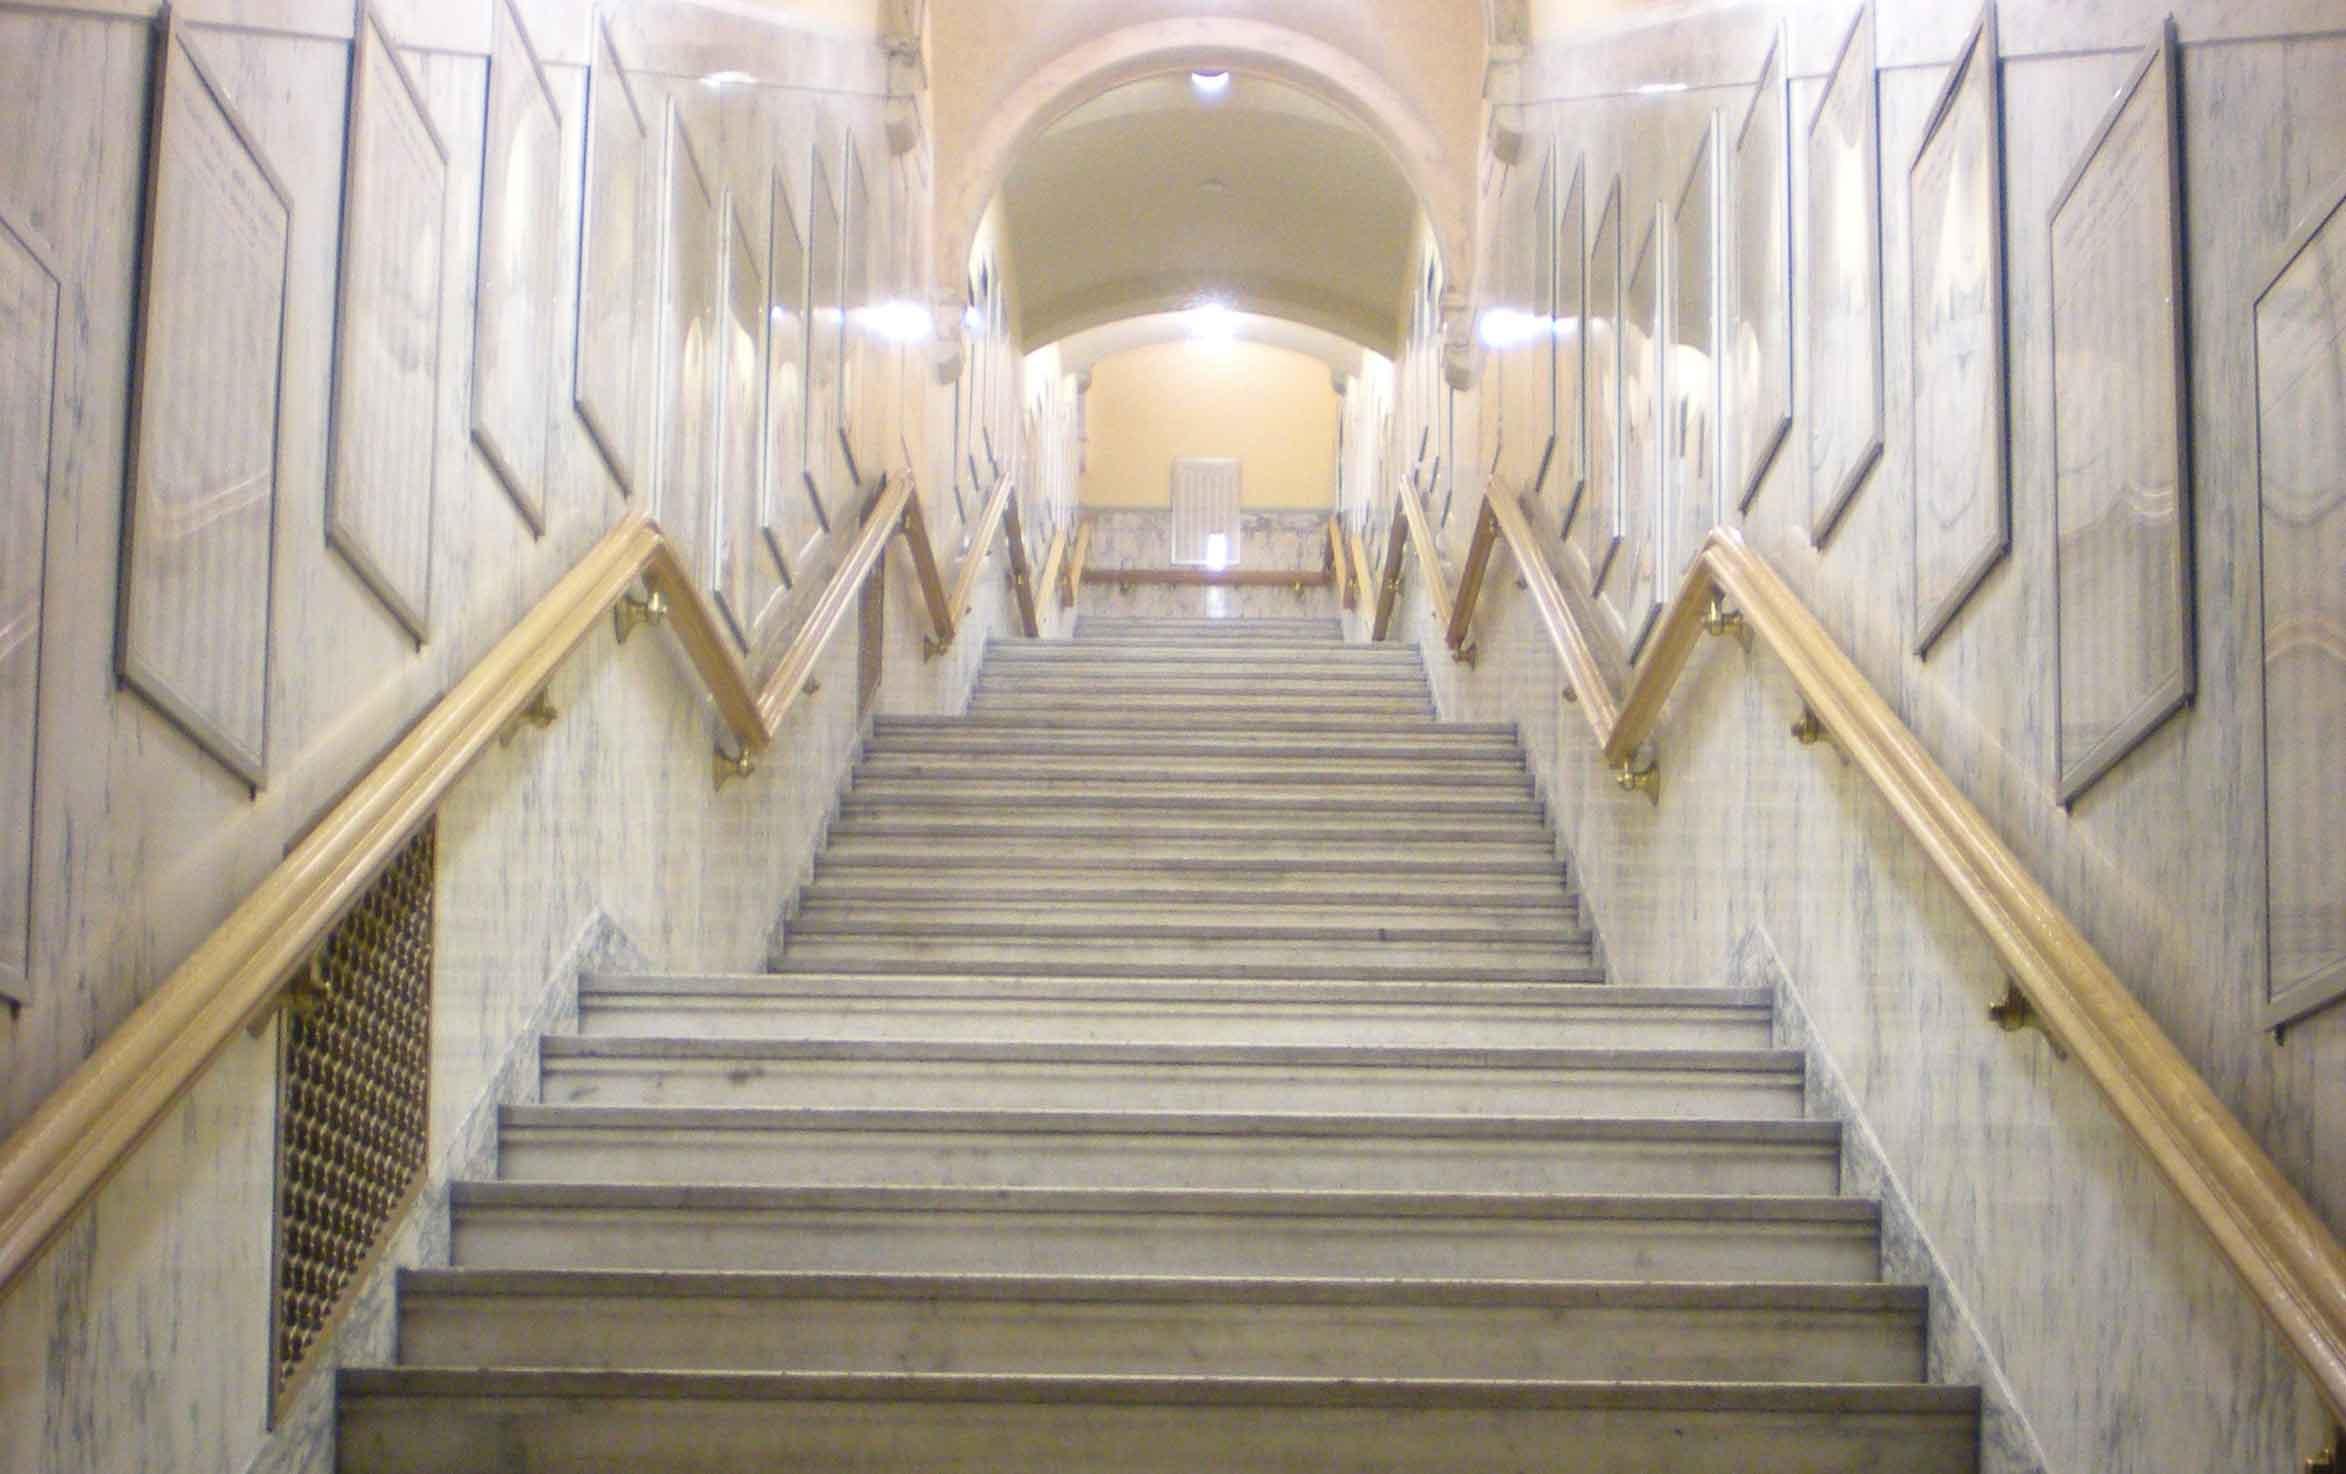 Indiana World War Memorial stairs